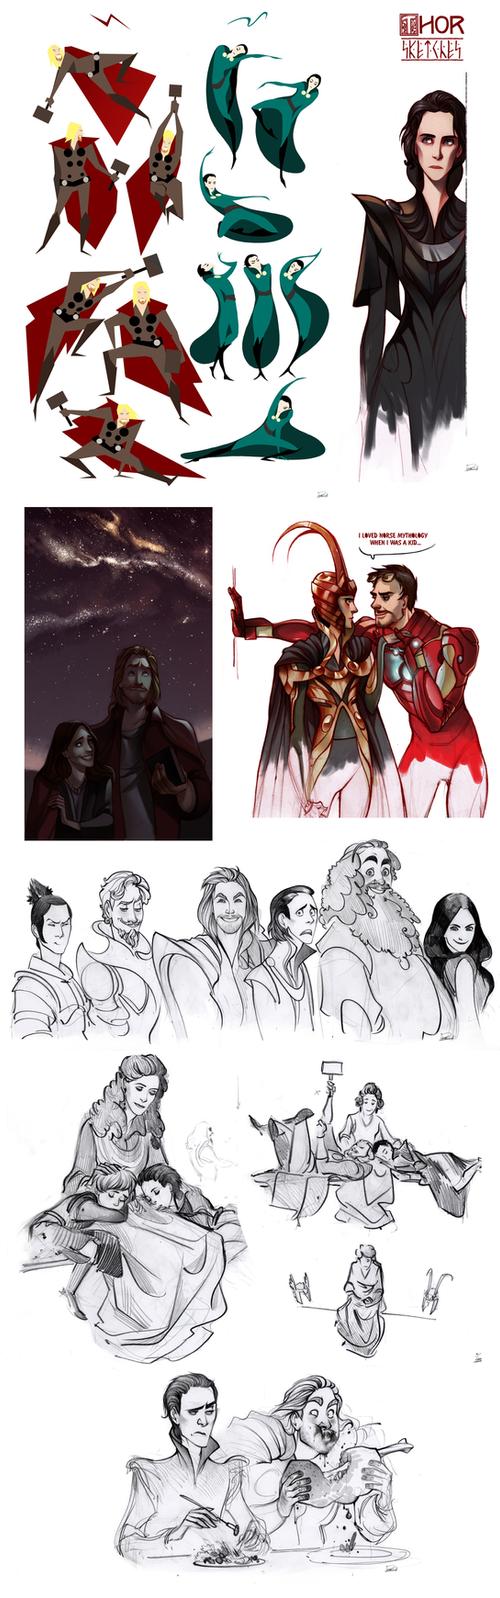 Thor sketchdump by Phobs